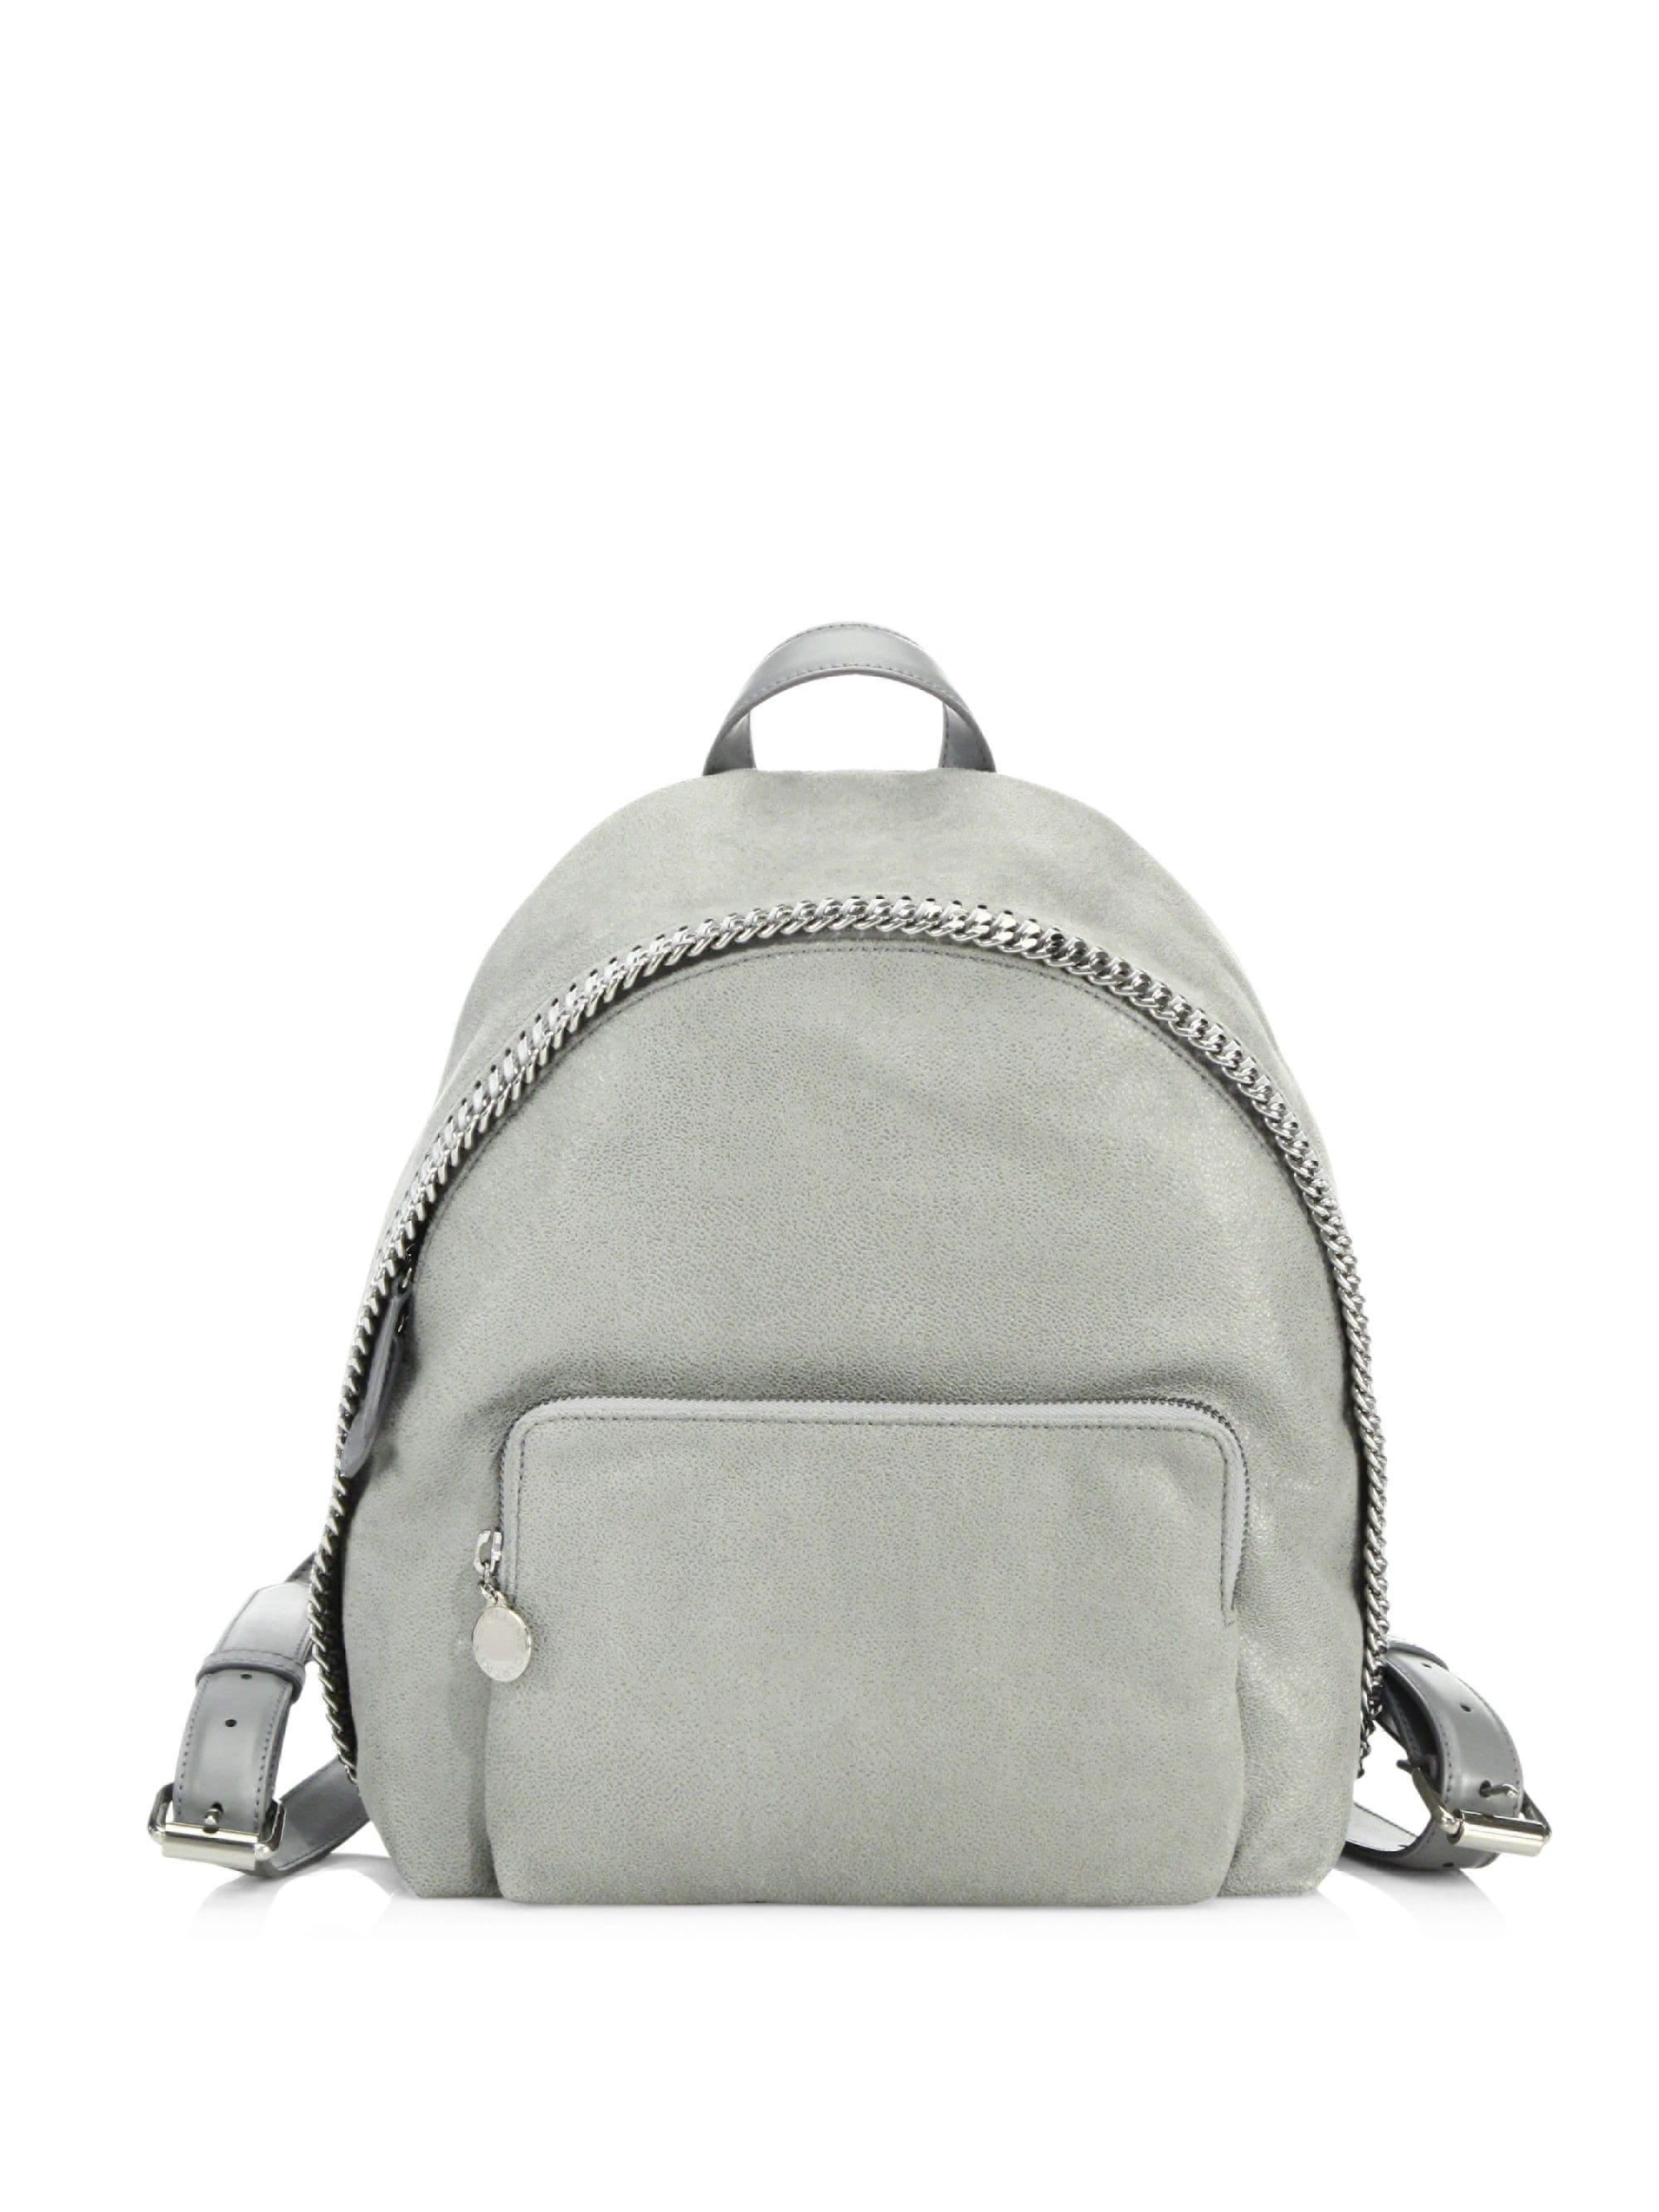 523ebf85a993 Stella McCartney. Gray Women s Falabella Small Faux Leather Backpack ...